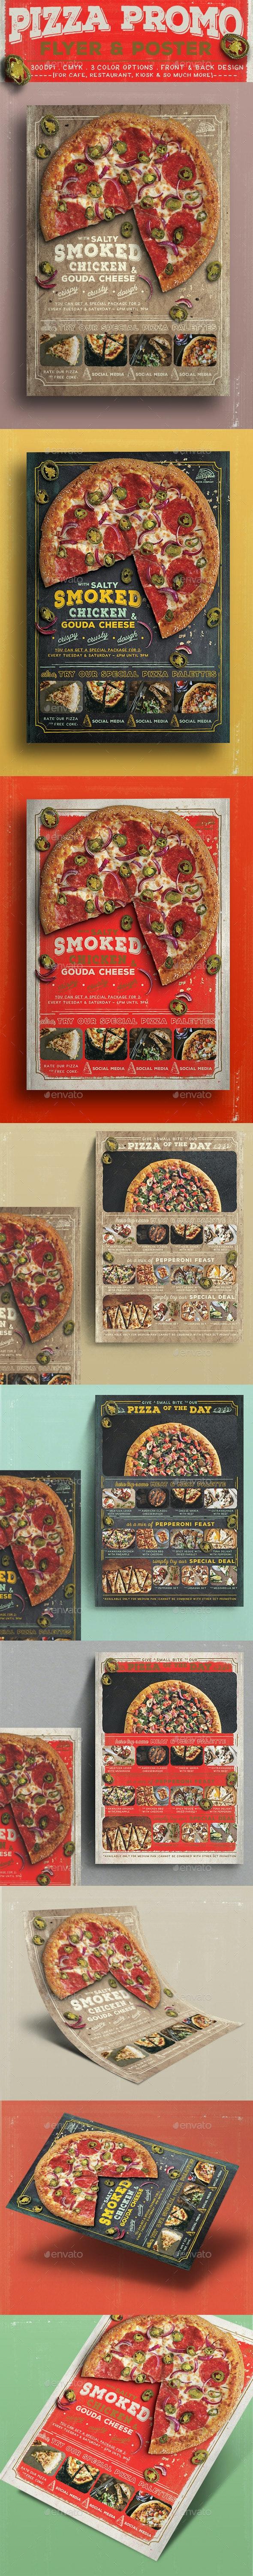 Pizza Promo Flyer - Food Menus Print Templates